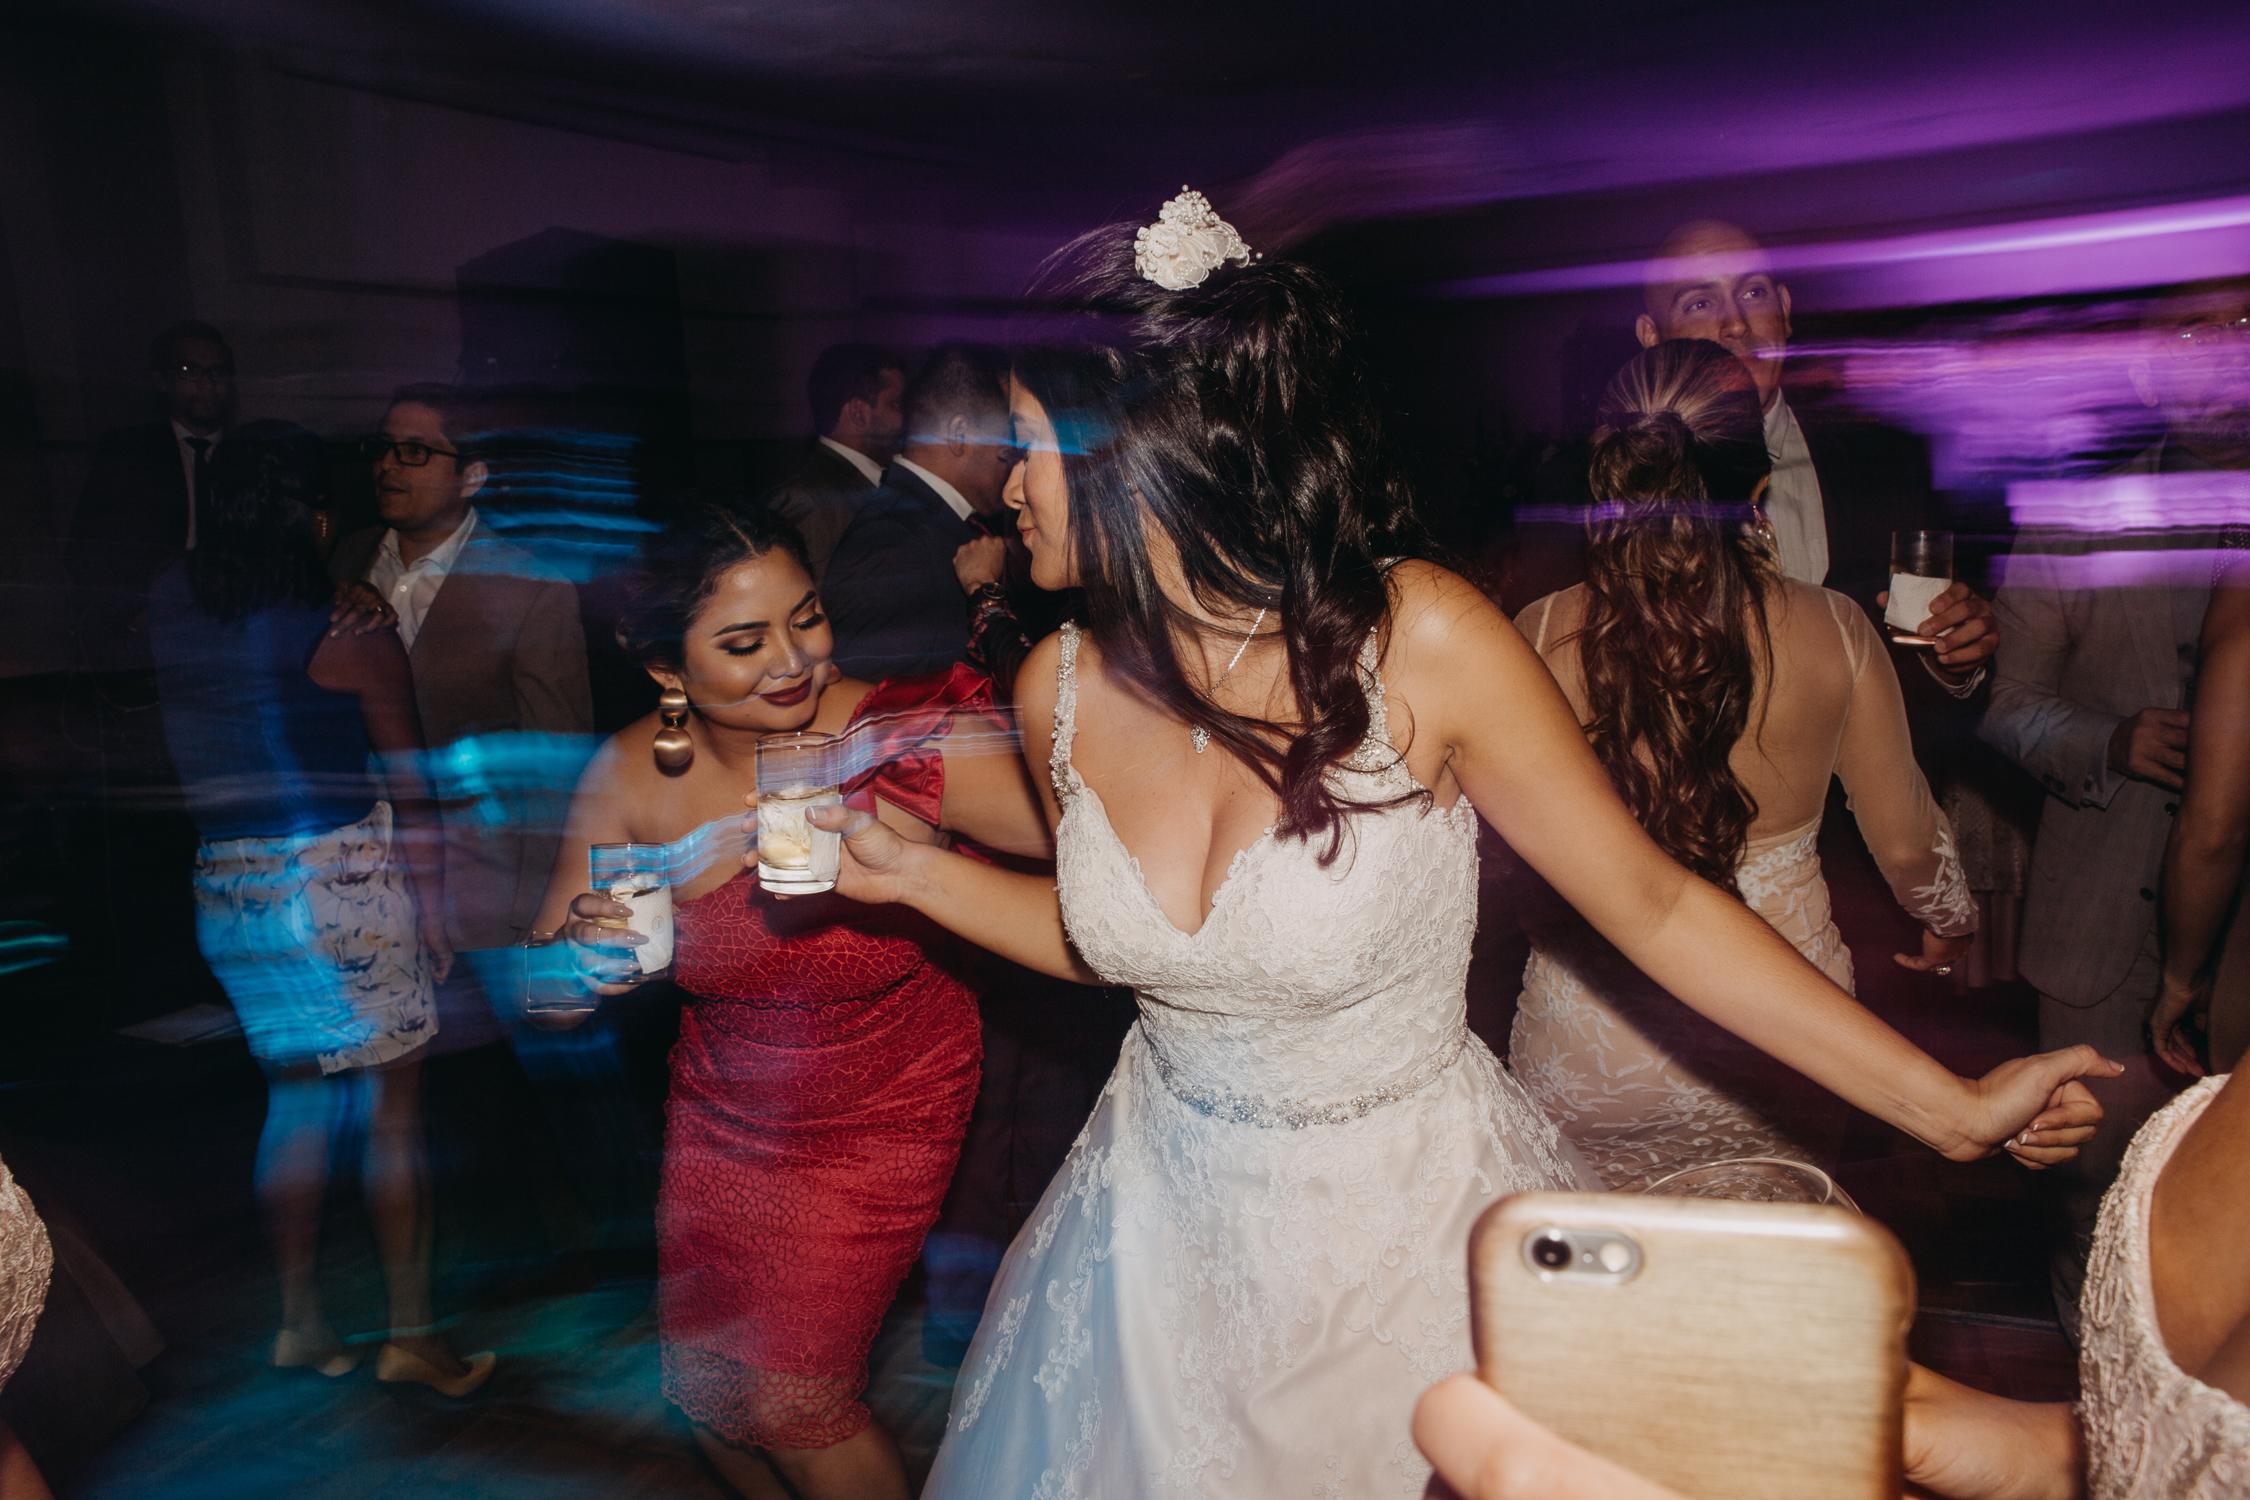 Michelle-Agurto-Fotografia-Bodas-Ecuador-Destination-Wedding-Photographer-Daniela-Dirk-108.JPG